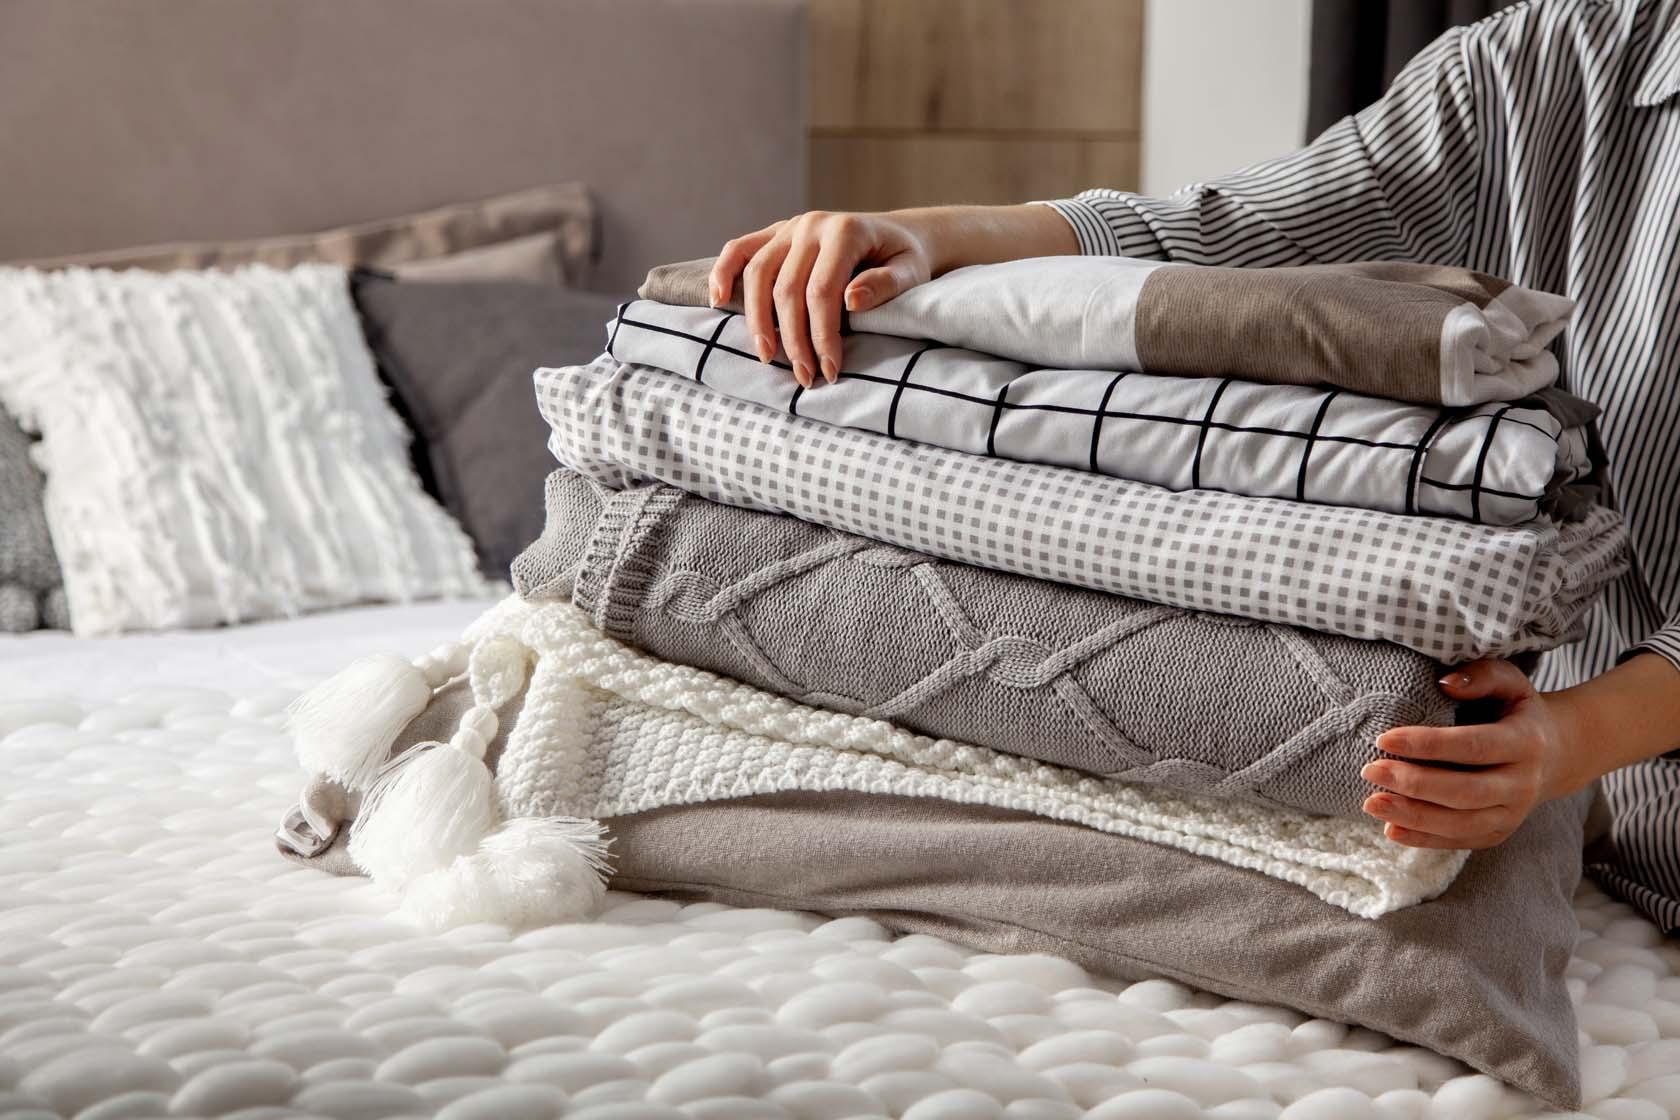 Buying Bedsheets Online